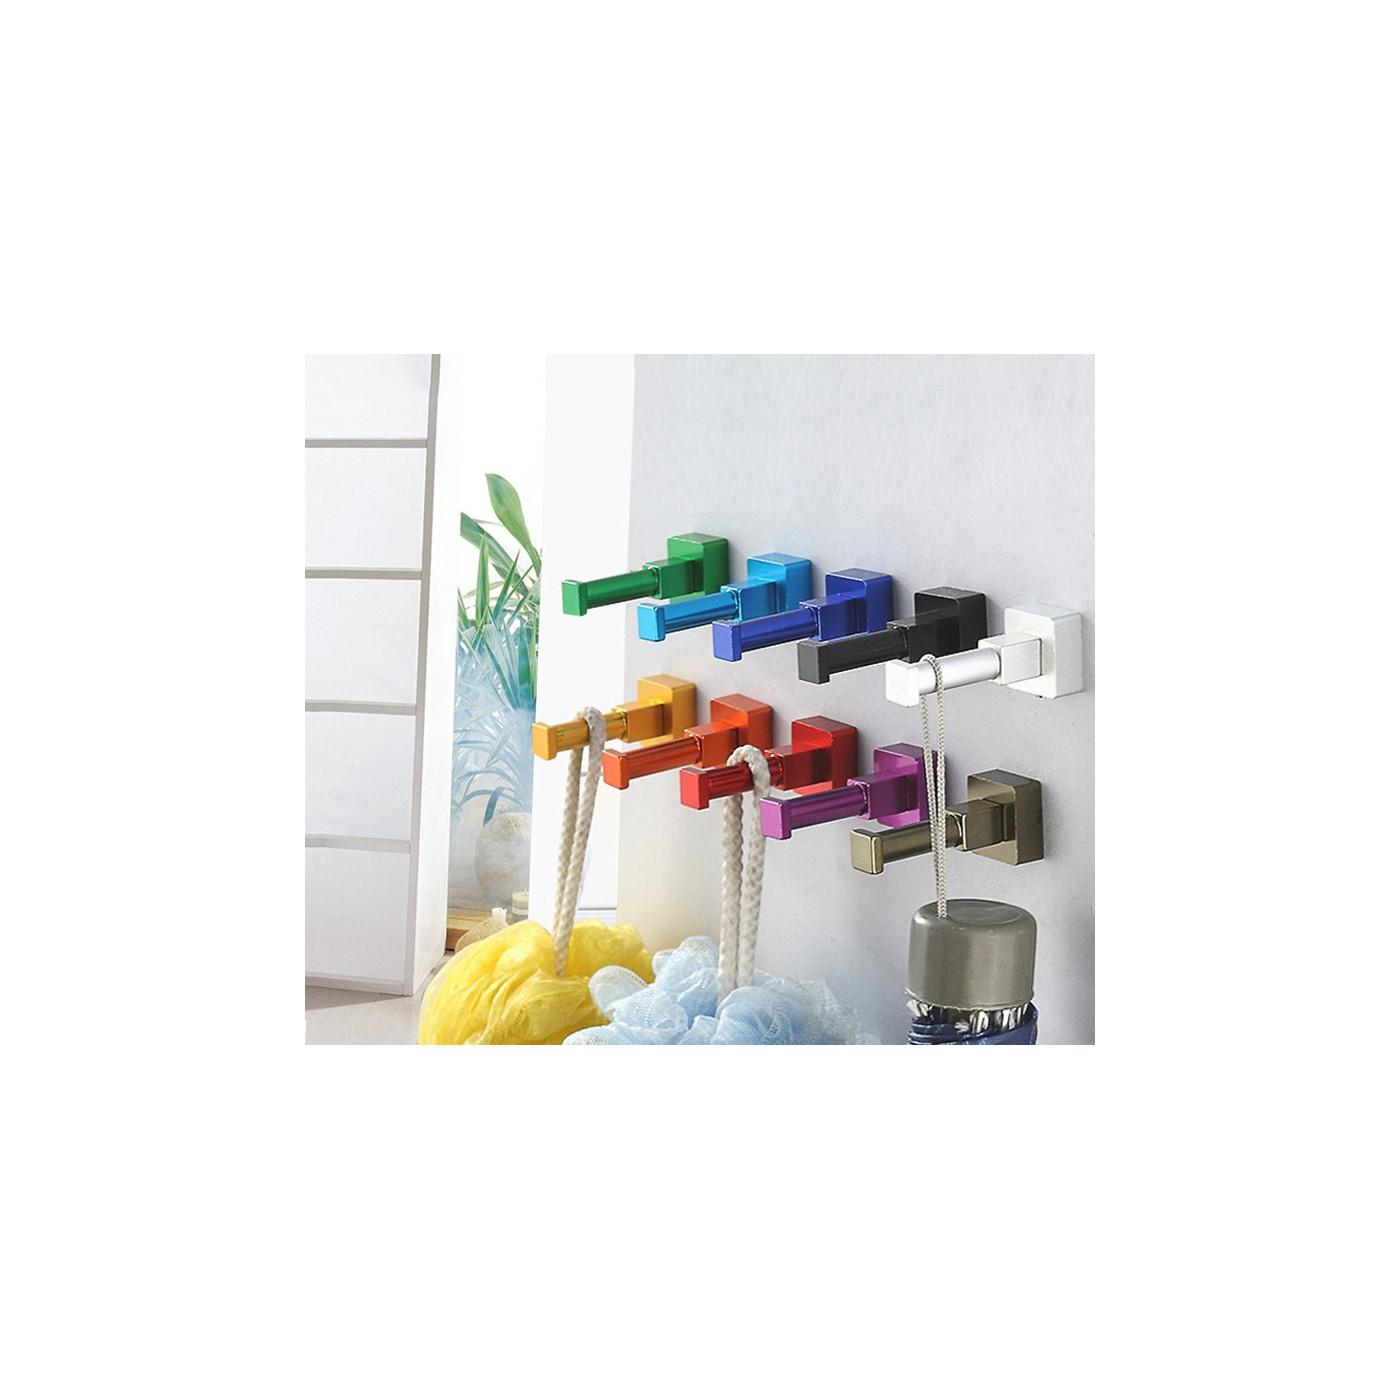 Set van 10 kleurrijke kledinghaken (brons, vierkant, aluminium)